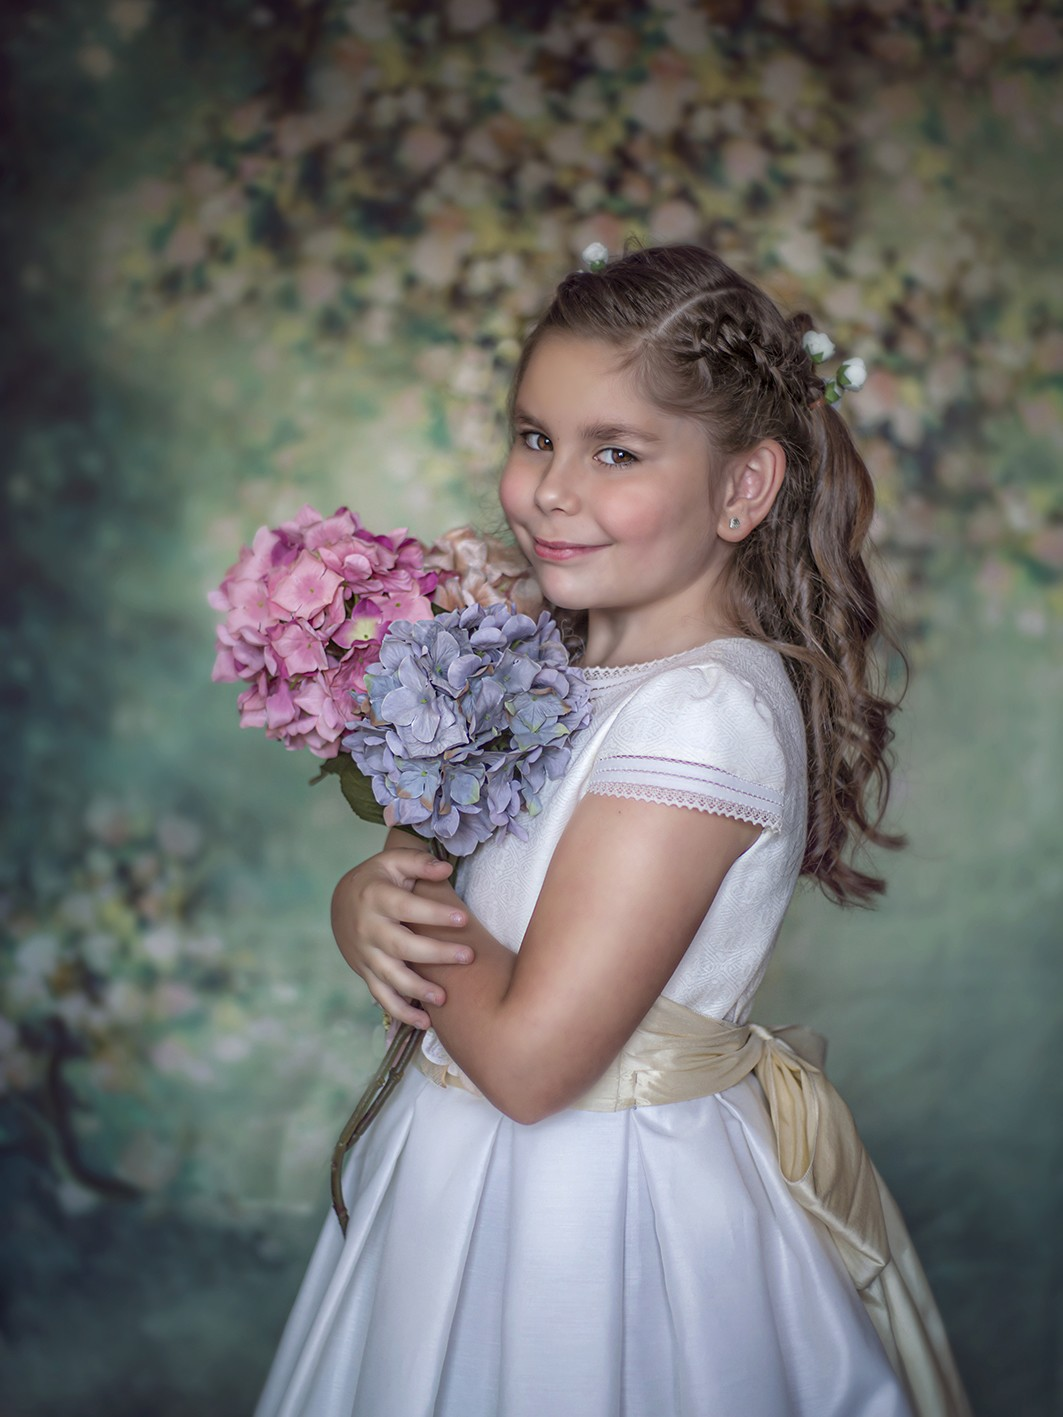 fotografa de niños y familias, comunión Maira 01